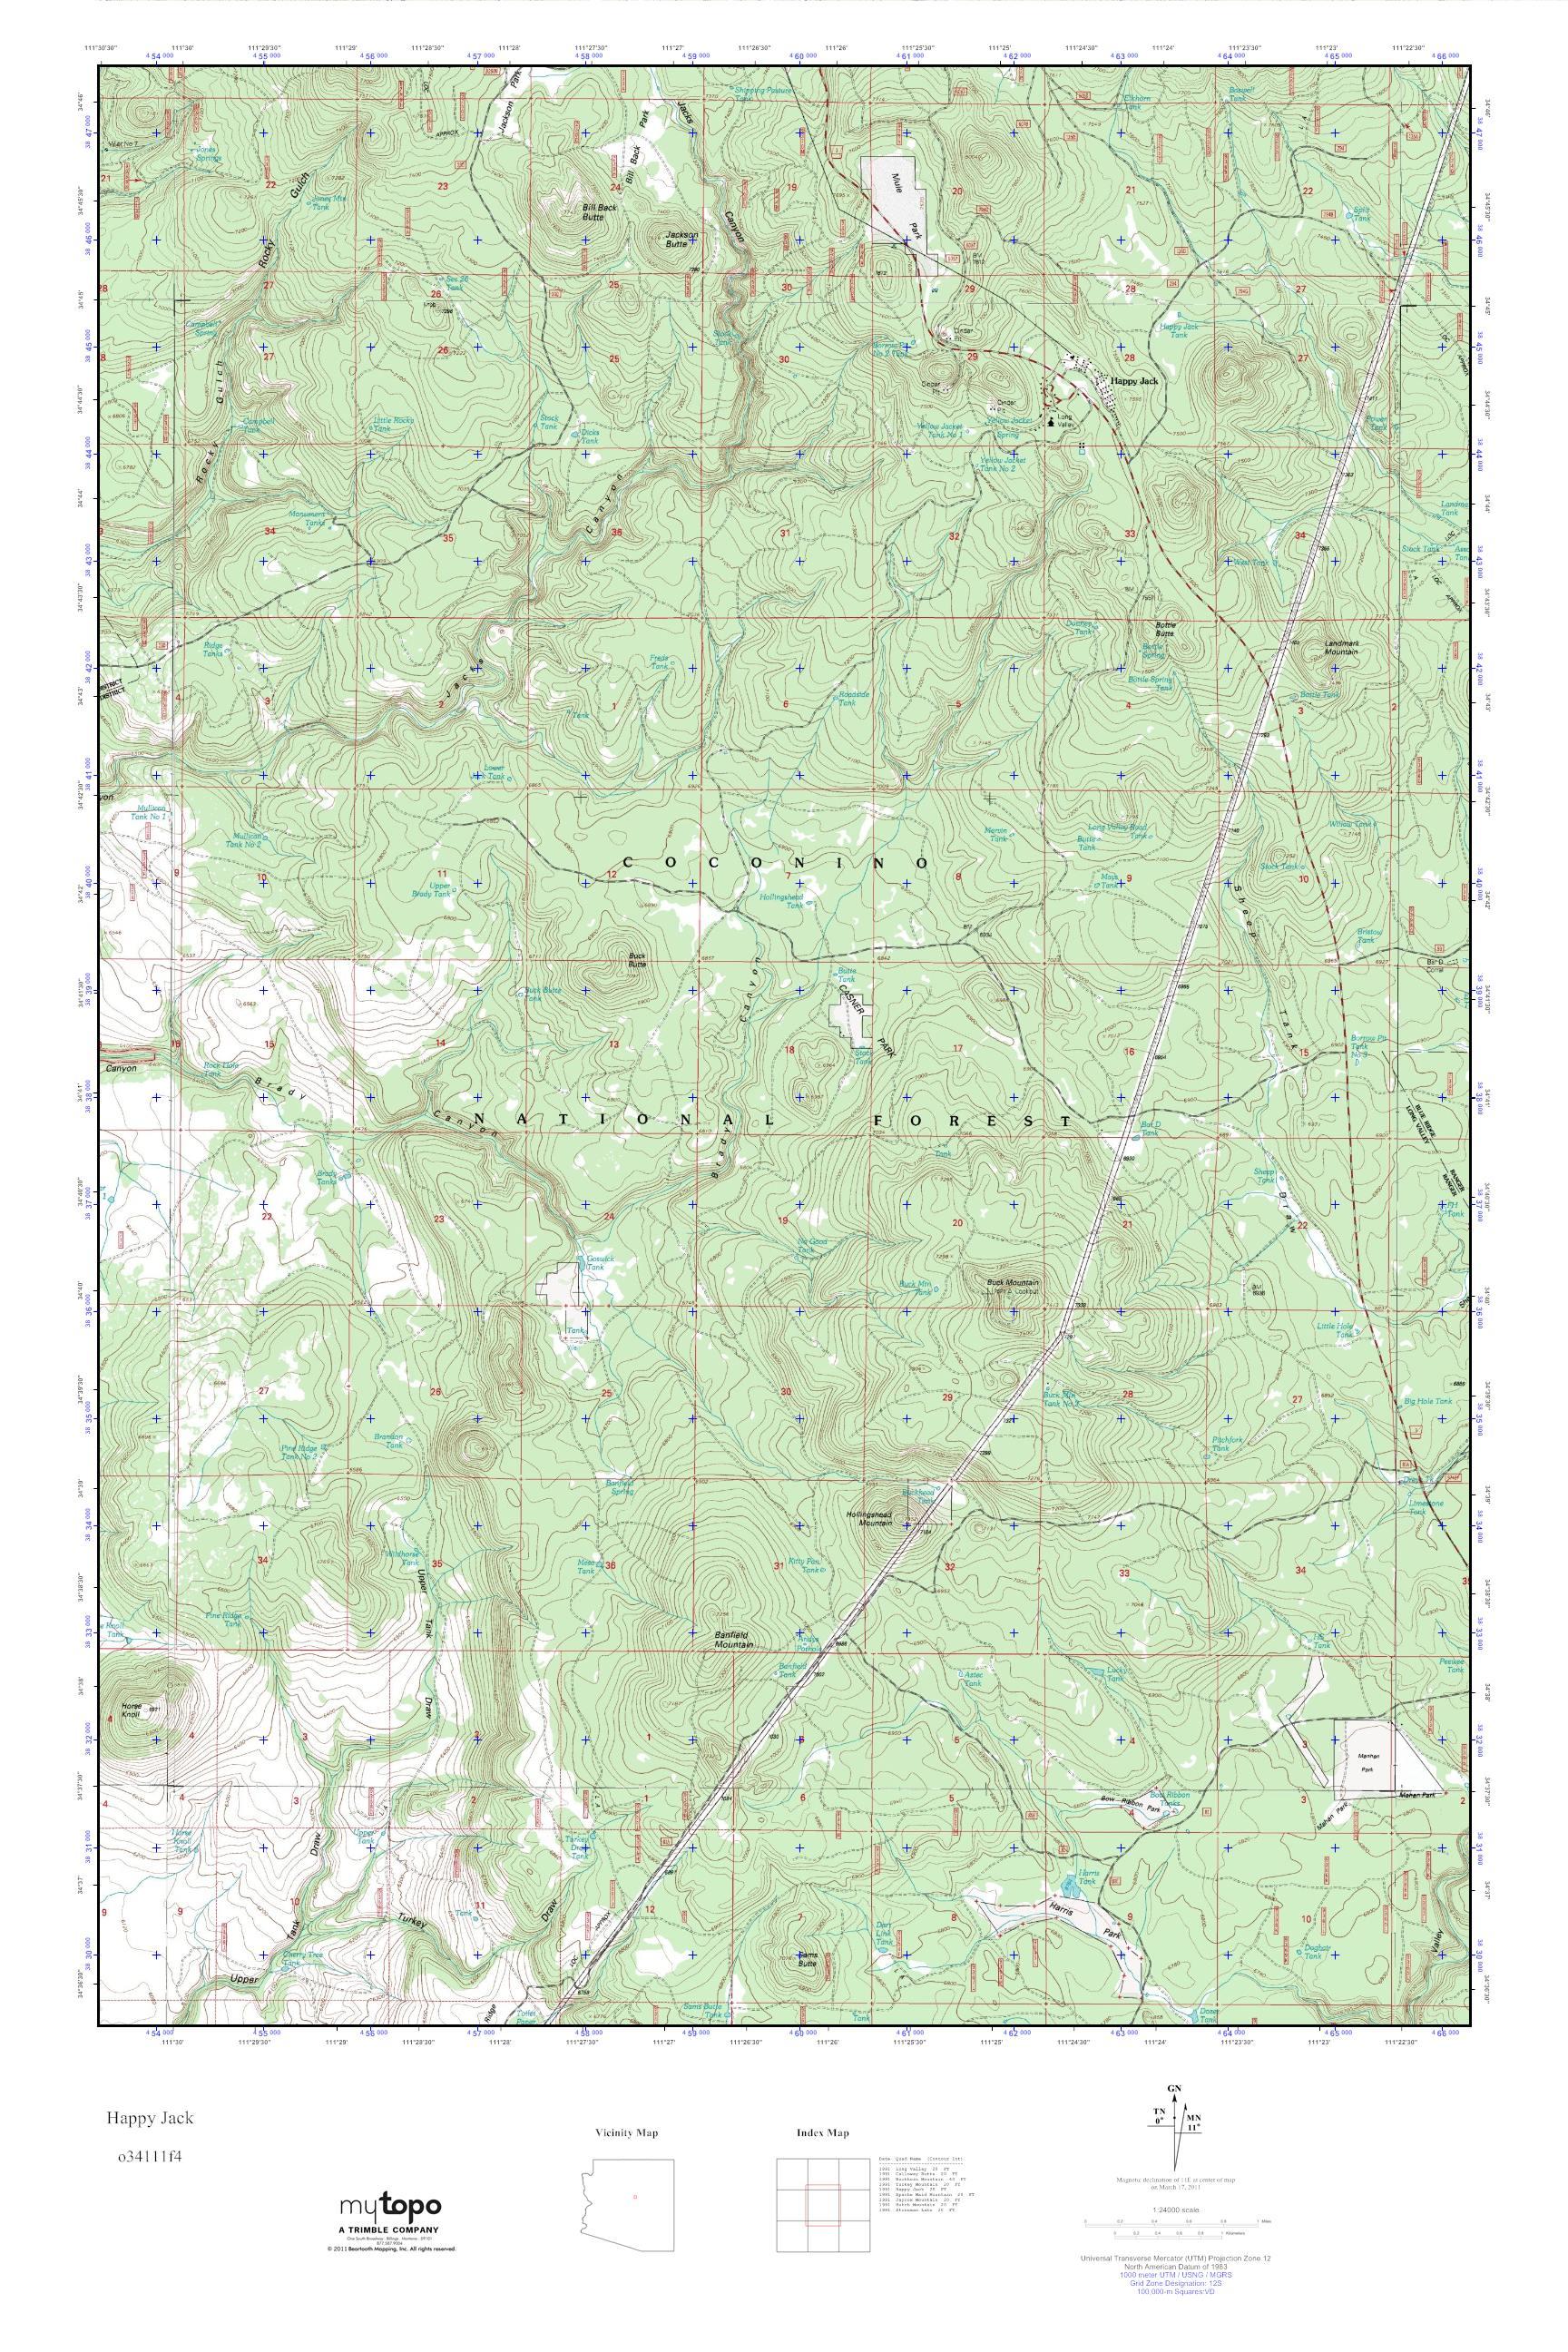 Happy Jack Arizona Map.Mytopo Happy Jack Arizona Usgs Quad Topo Map